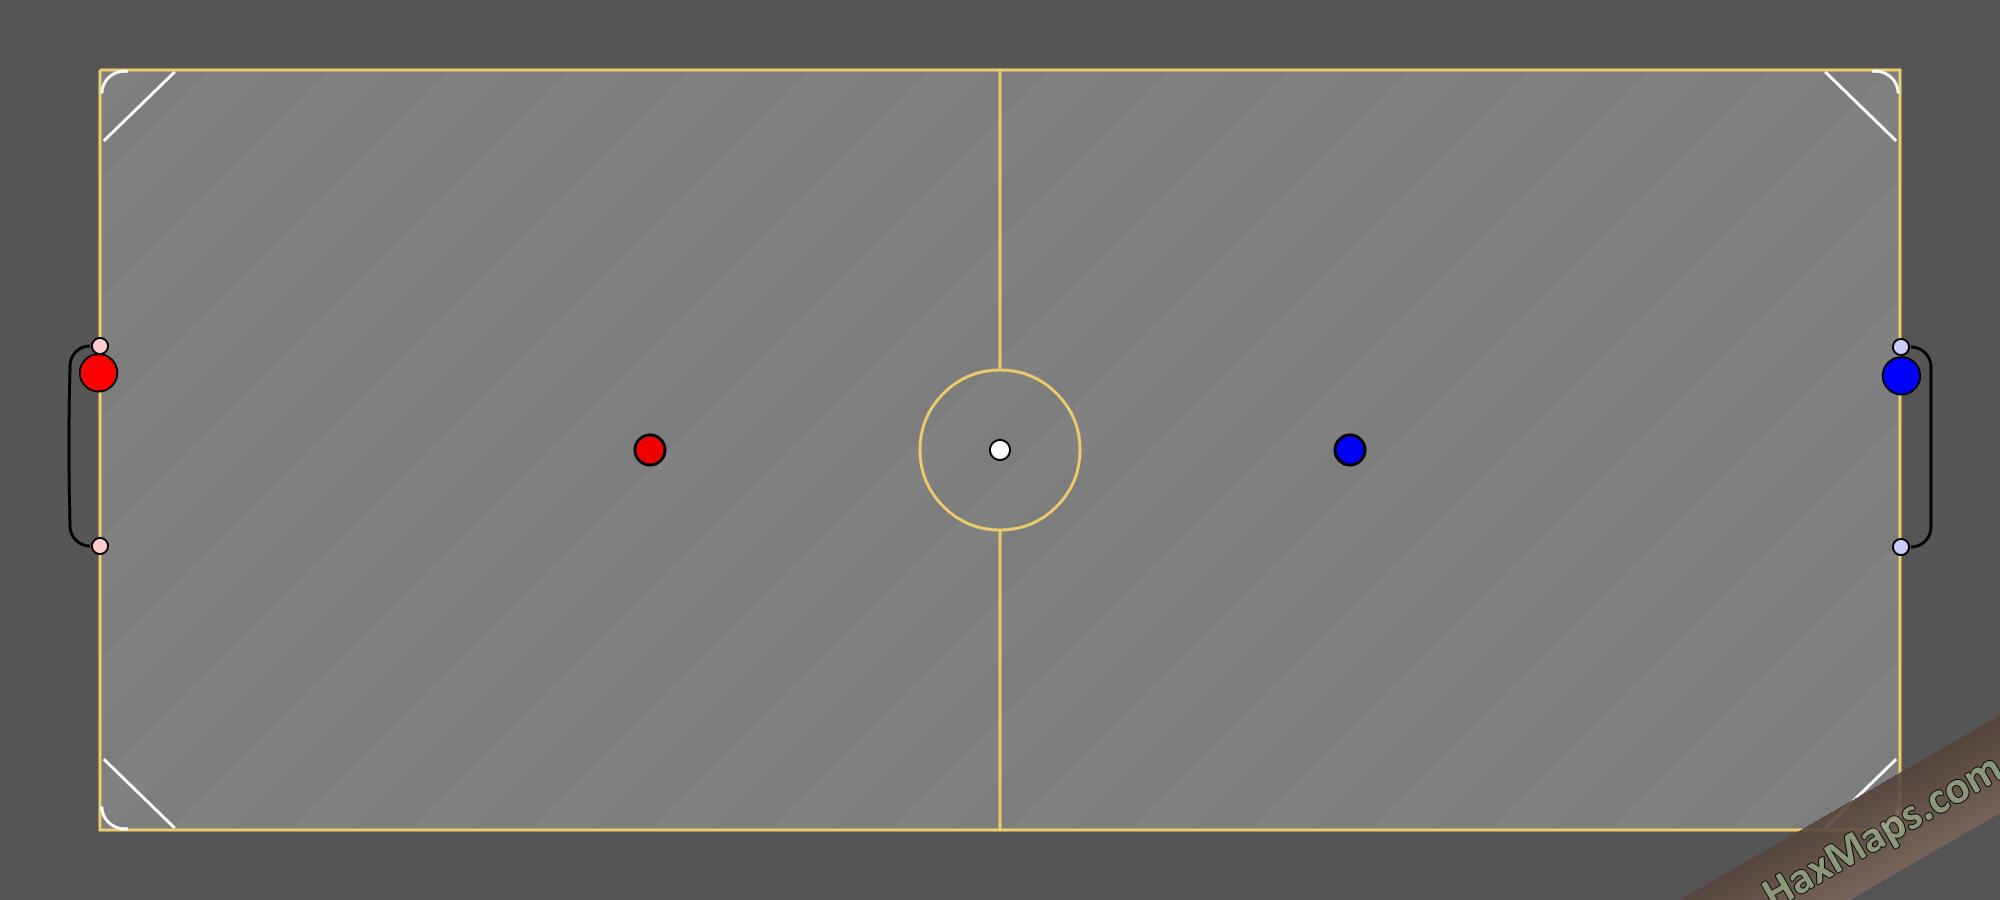 hax ball maps | hugegoalkeeper